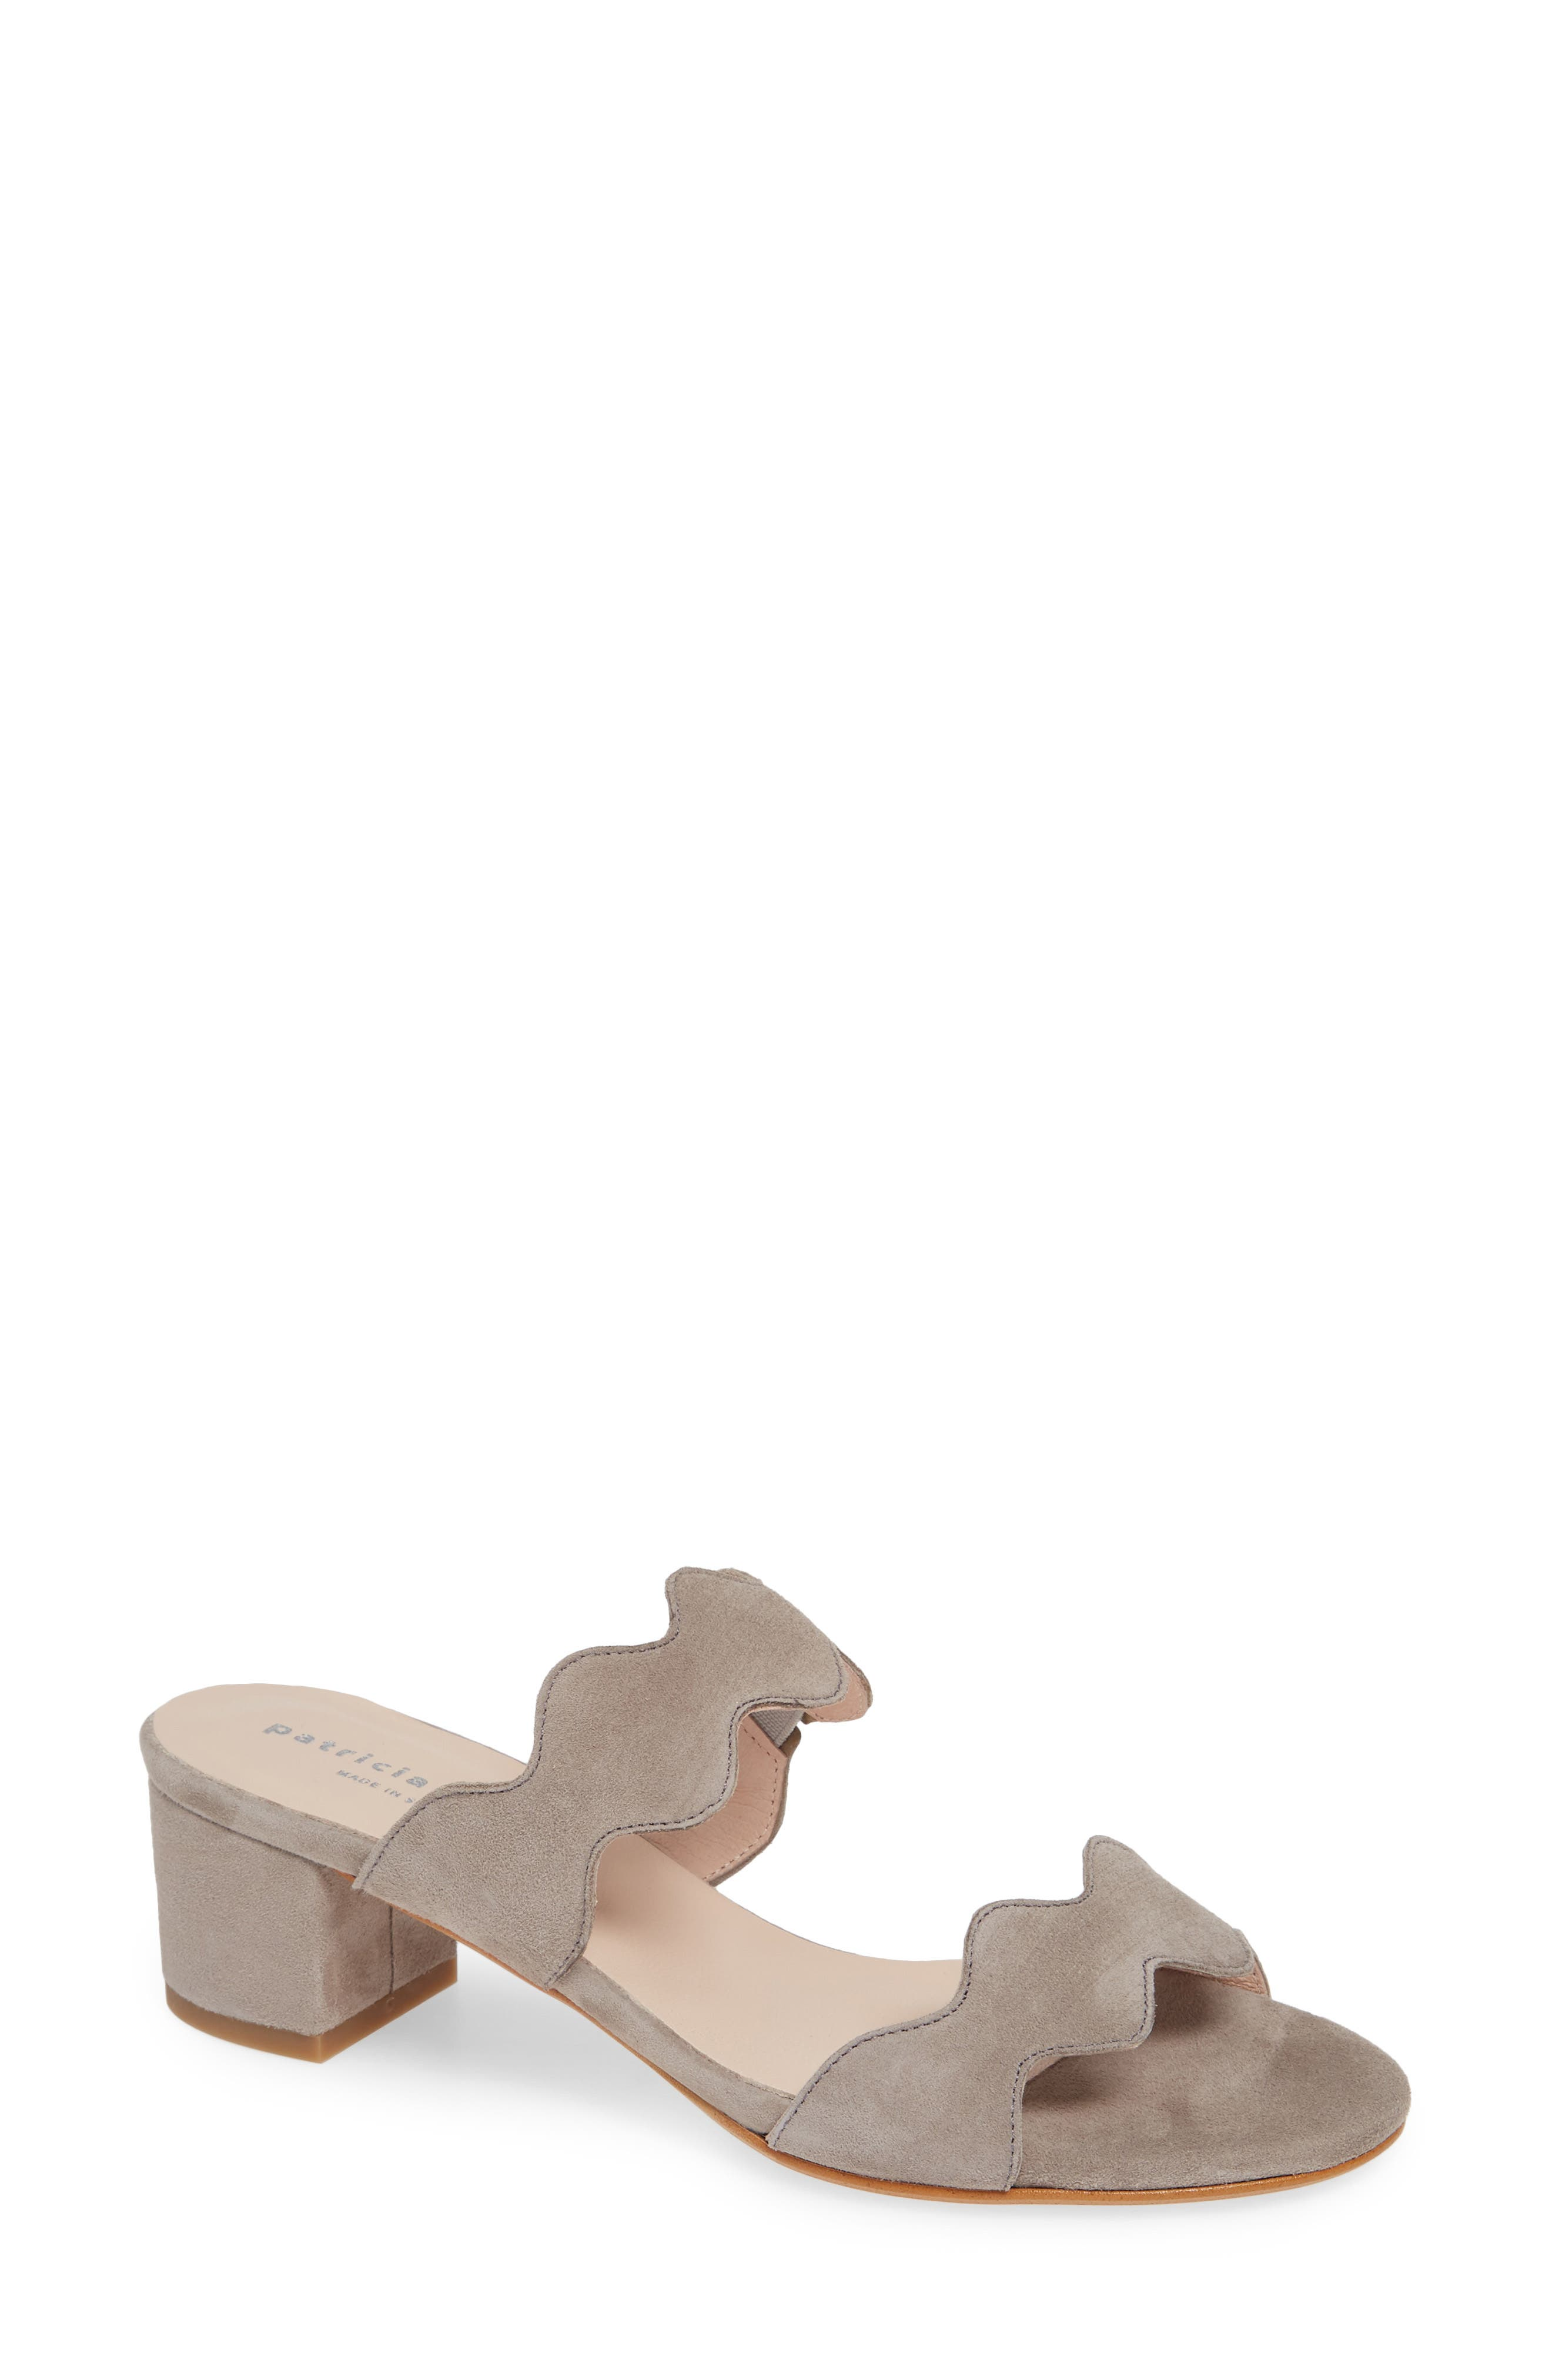 Patricia Green Palm Beach Slide Sandal, Grey